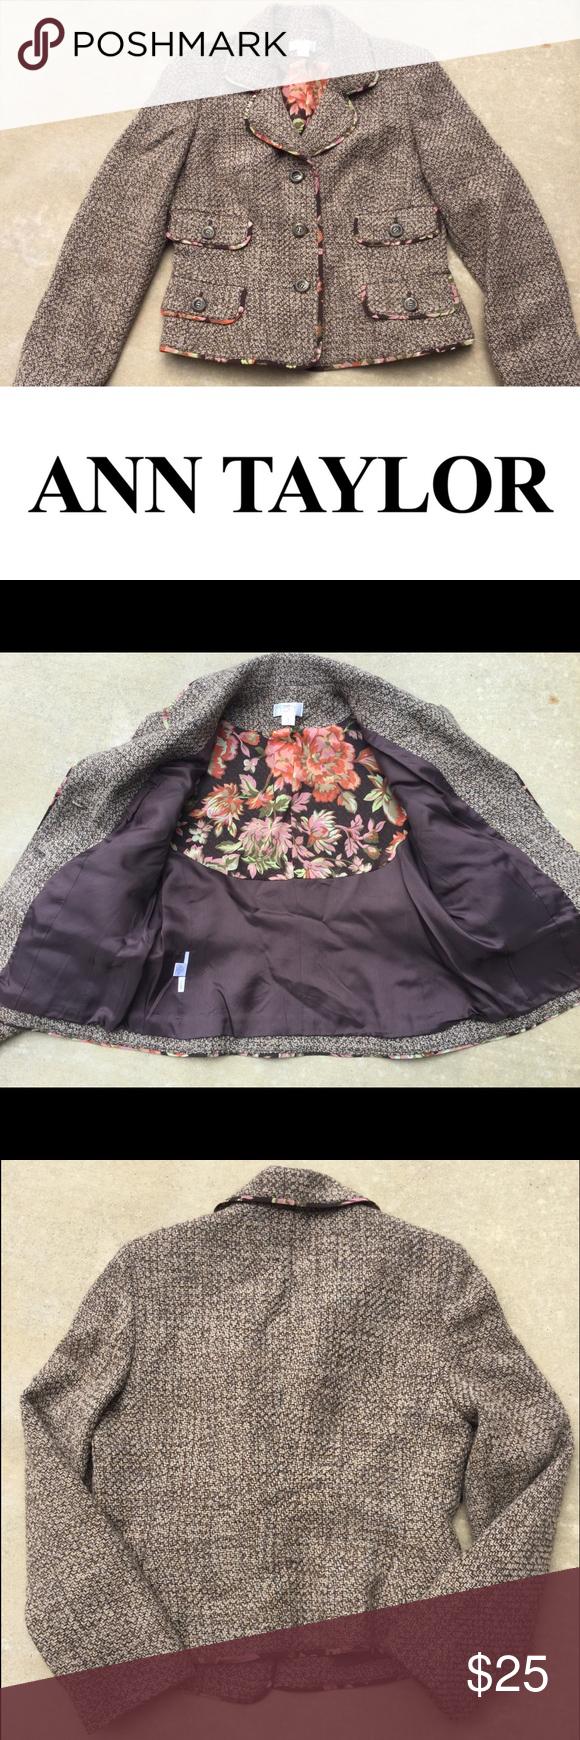 Ann Taylor Loft Blazer size 8 Anne Taylor Loft Blazer 53% wool, 46% acrylic, 1% other fibers. Floral trim. Blazer is lined. Size 8. Ann Taylor Jackets & Coats Blazers